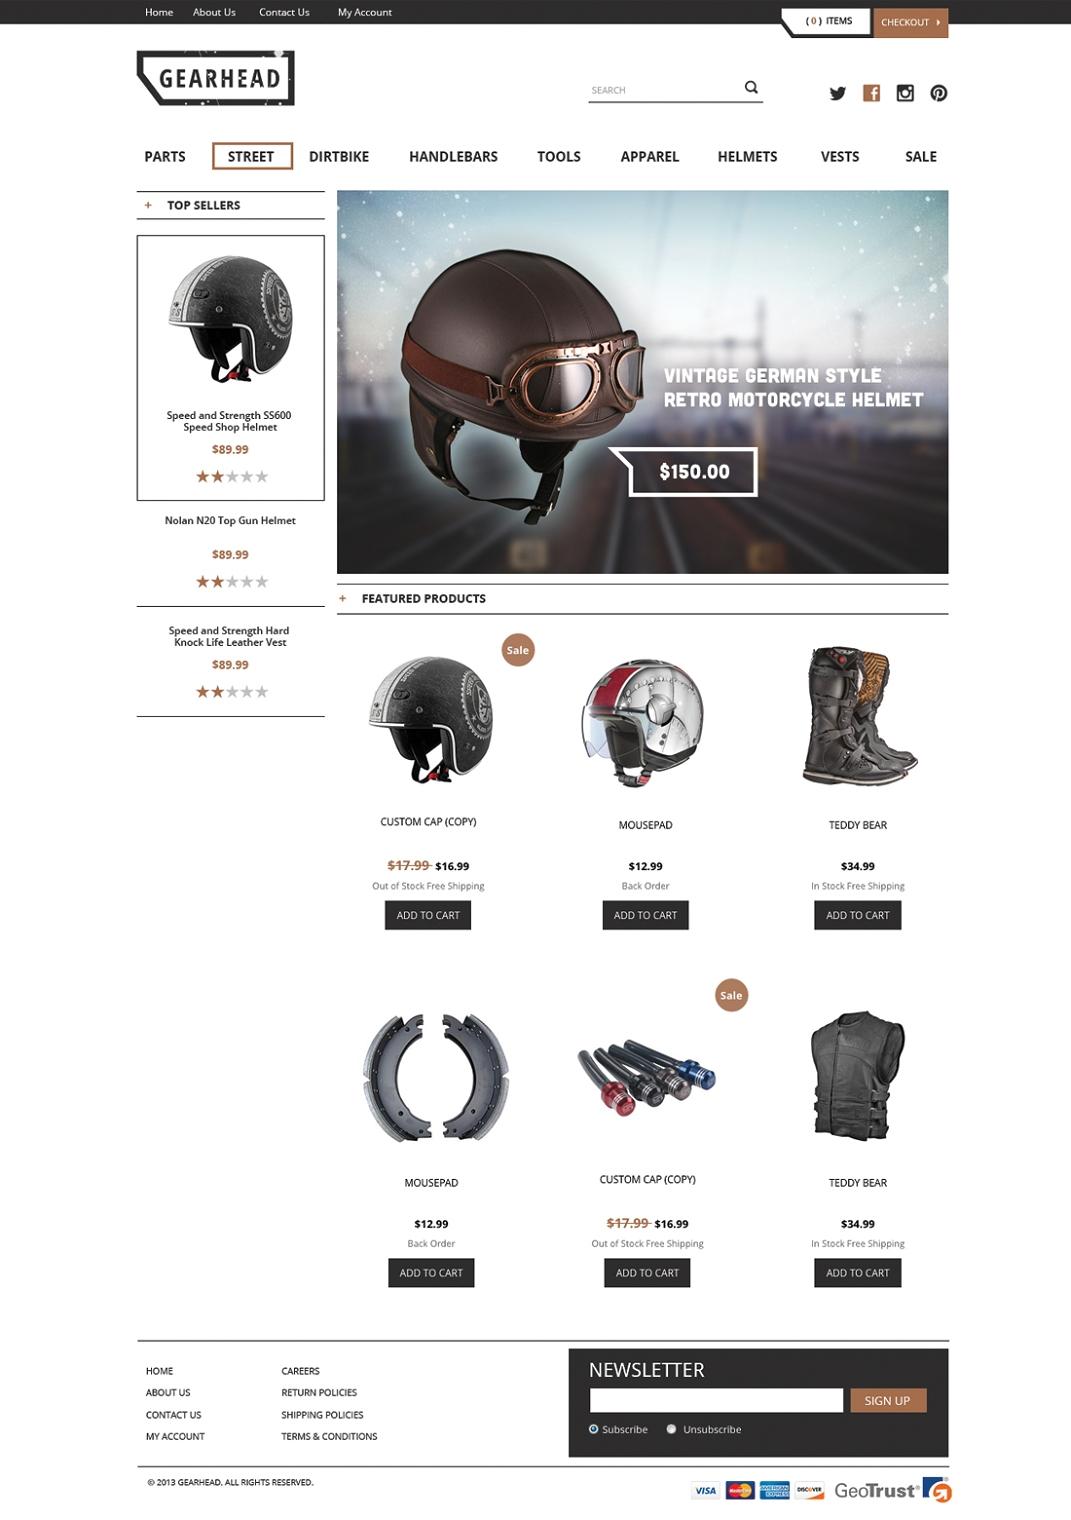 3Dcart Templates | 3dcart Responsive Templates For Your Store